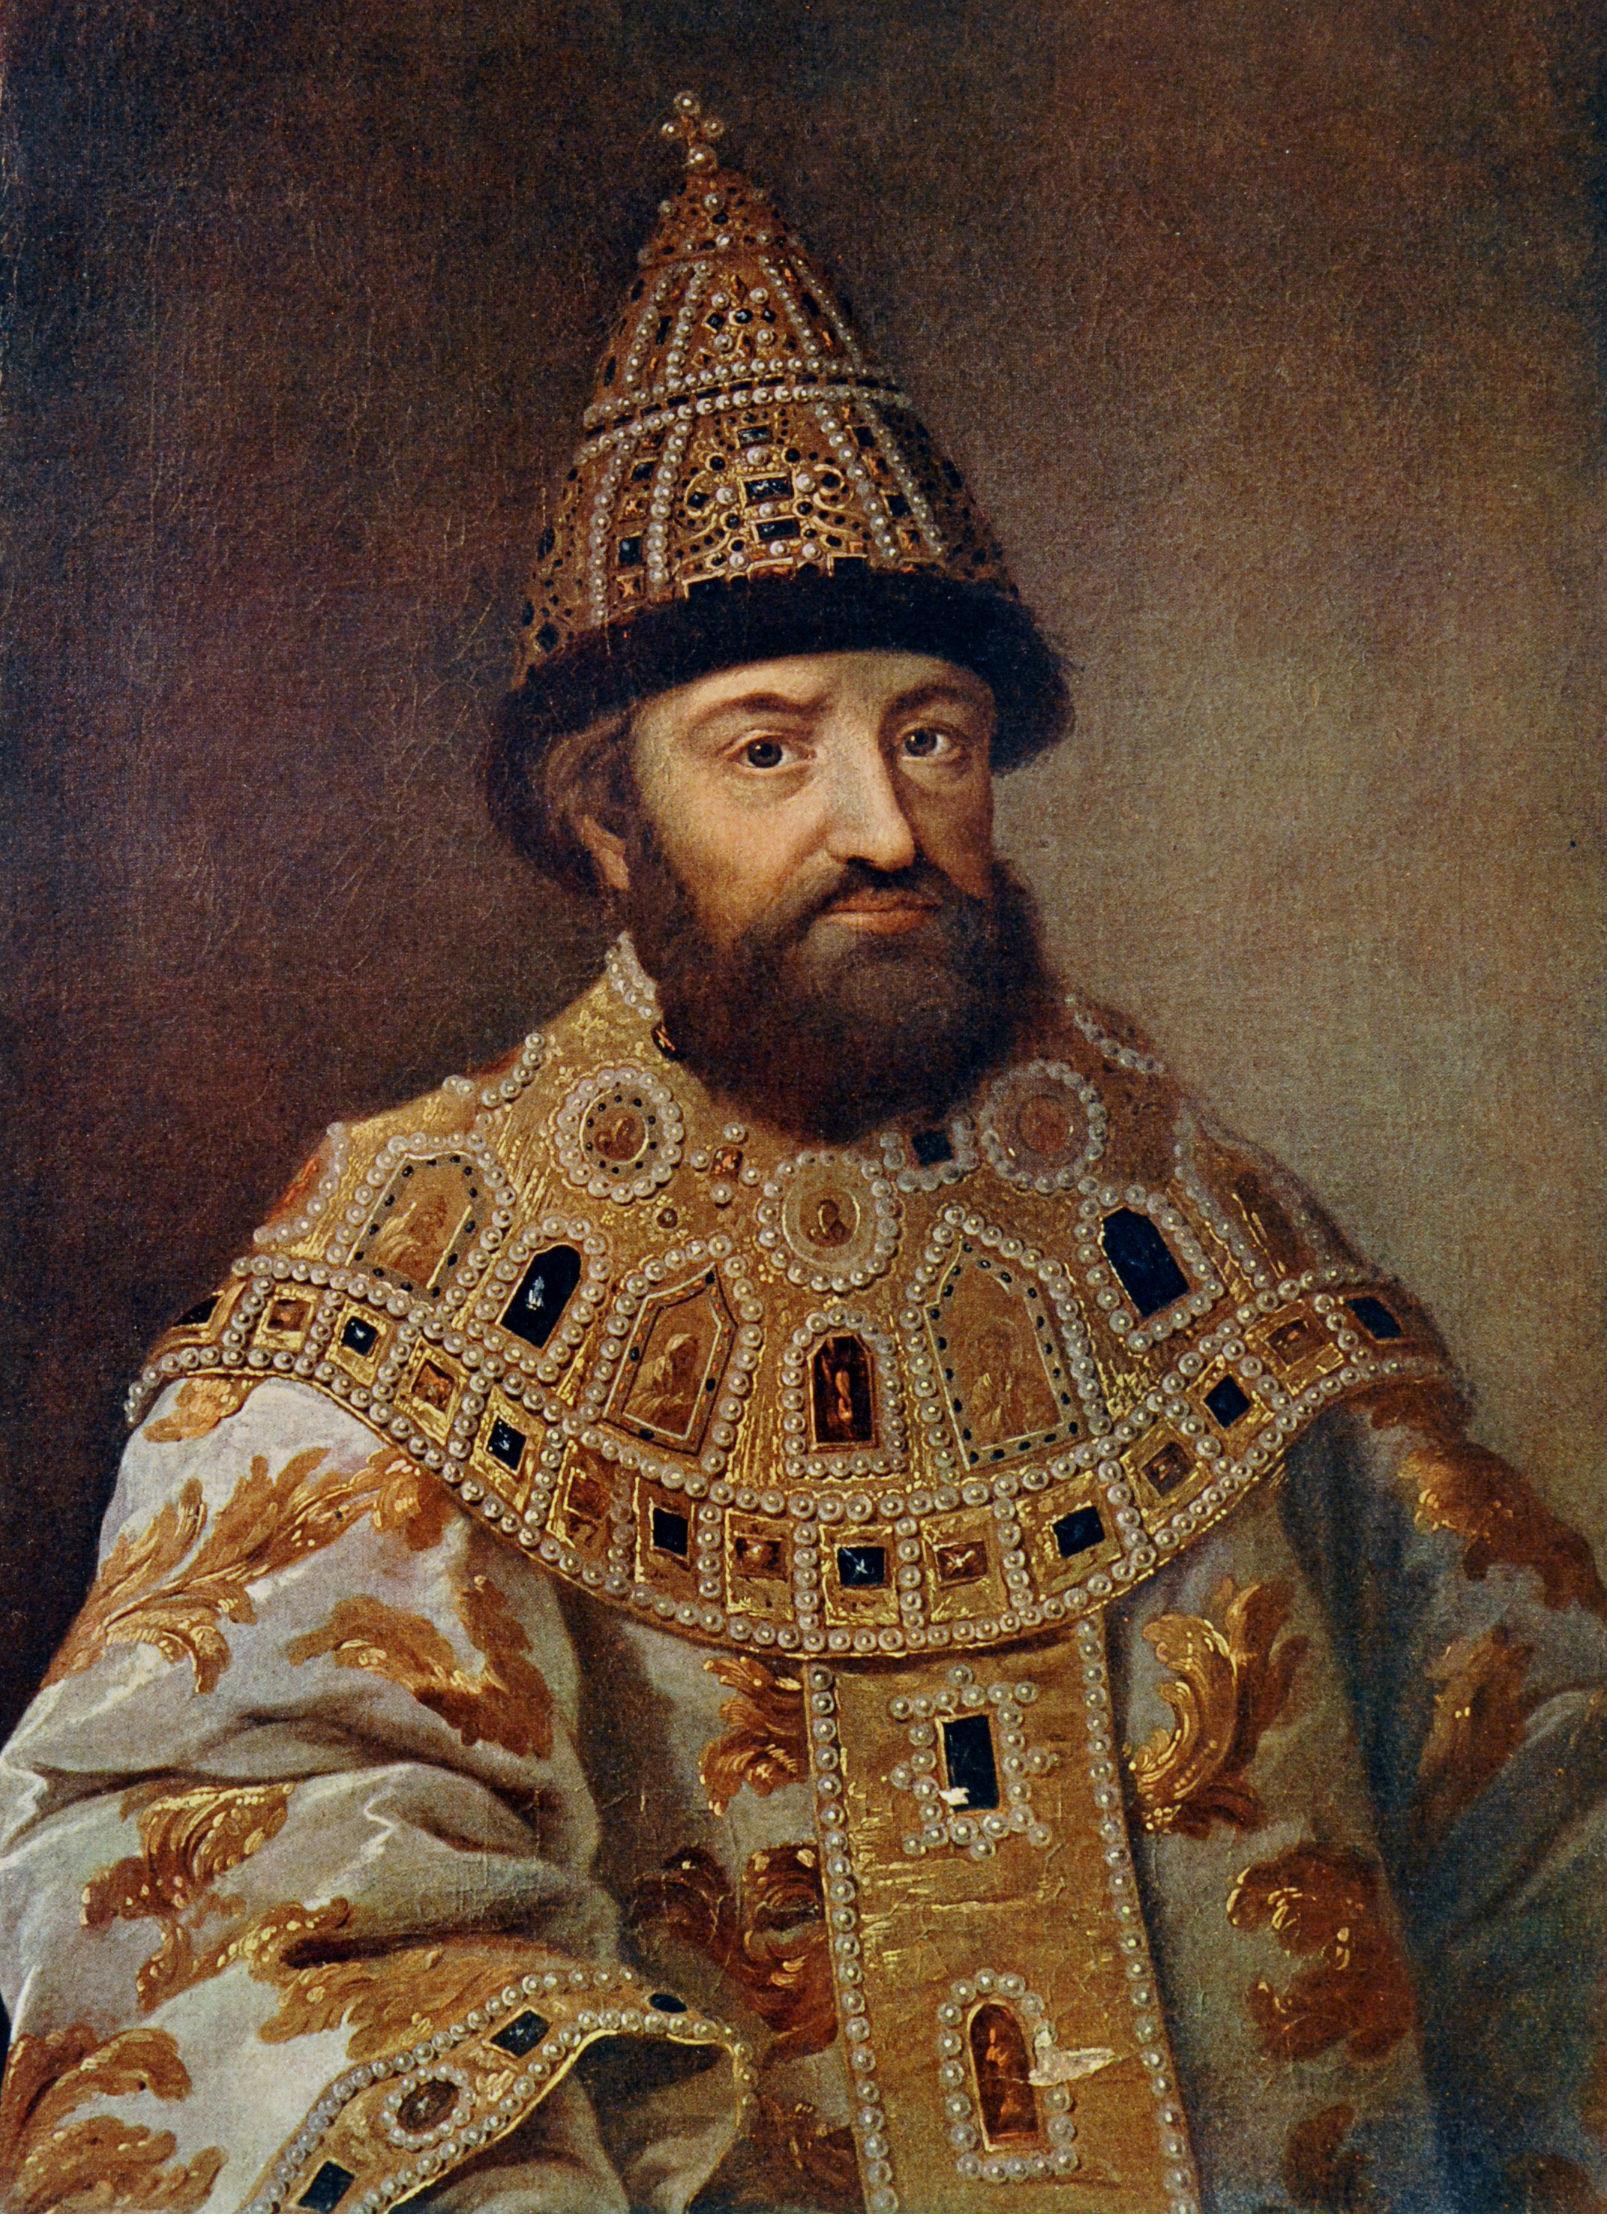 Mikhaïl Fiodorovitch